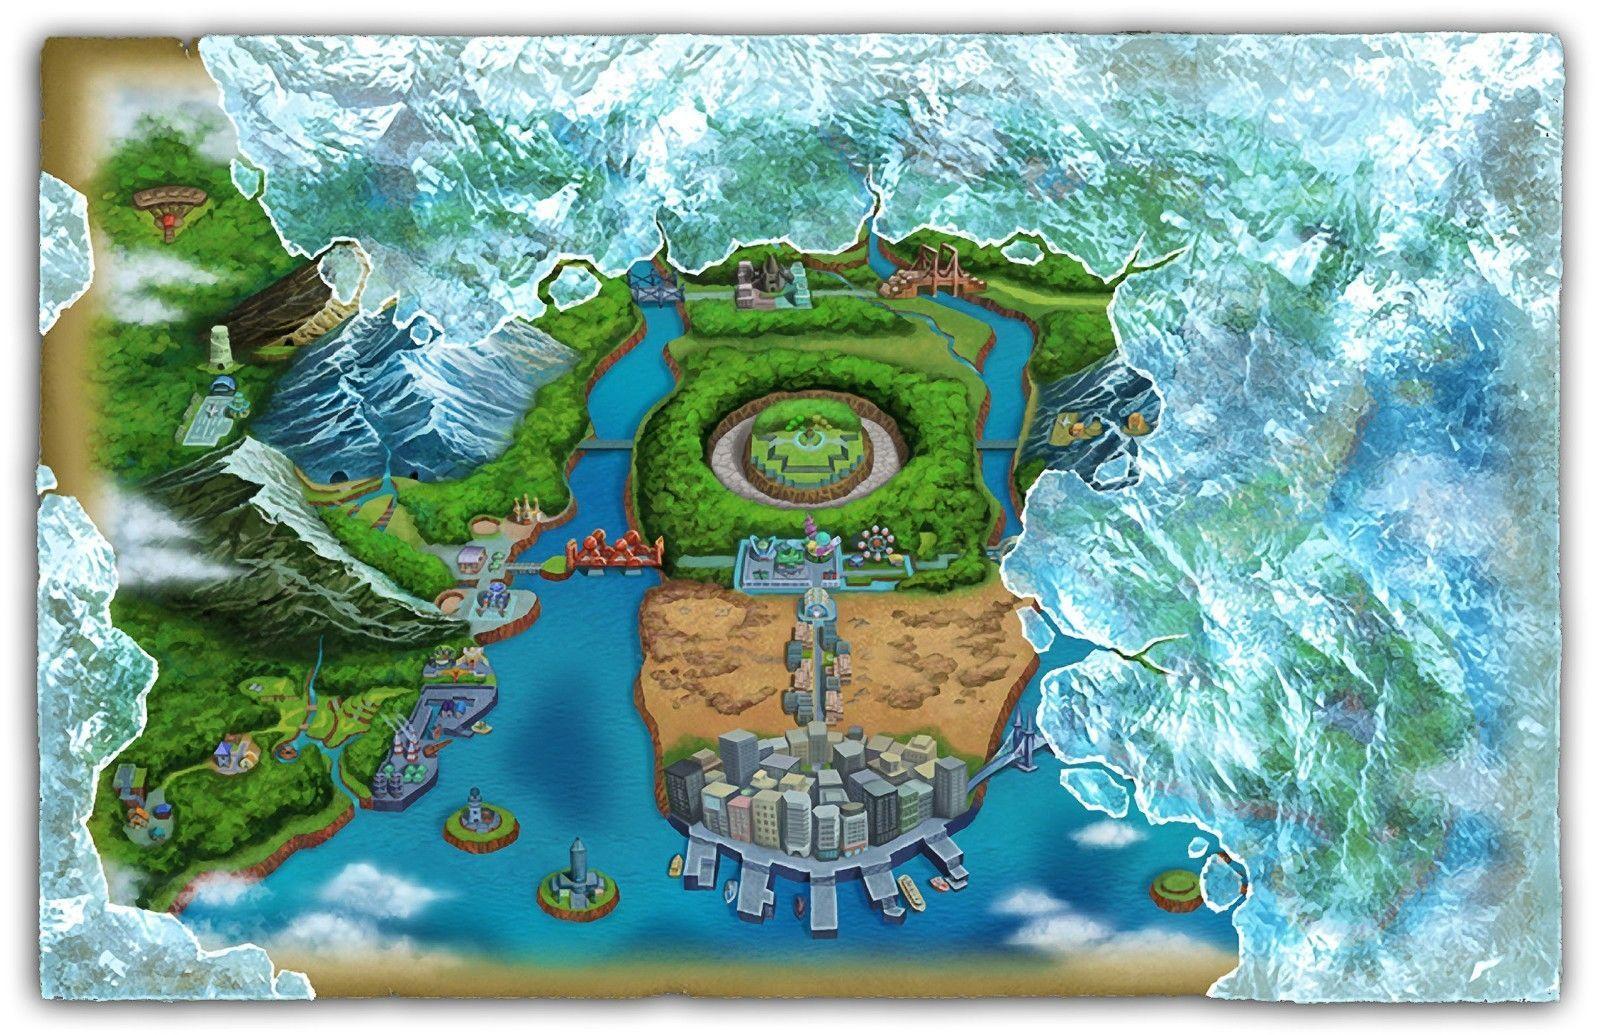 Pokemon Unova Region Map Pokemon Black And White Black Pokemon